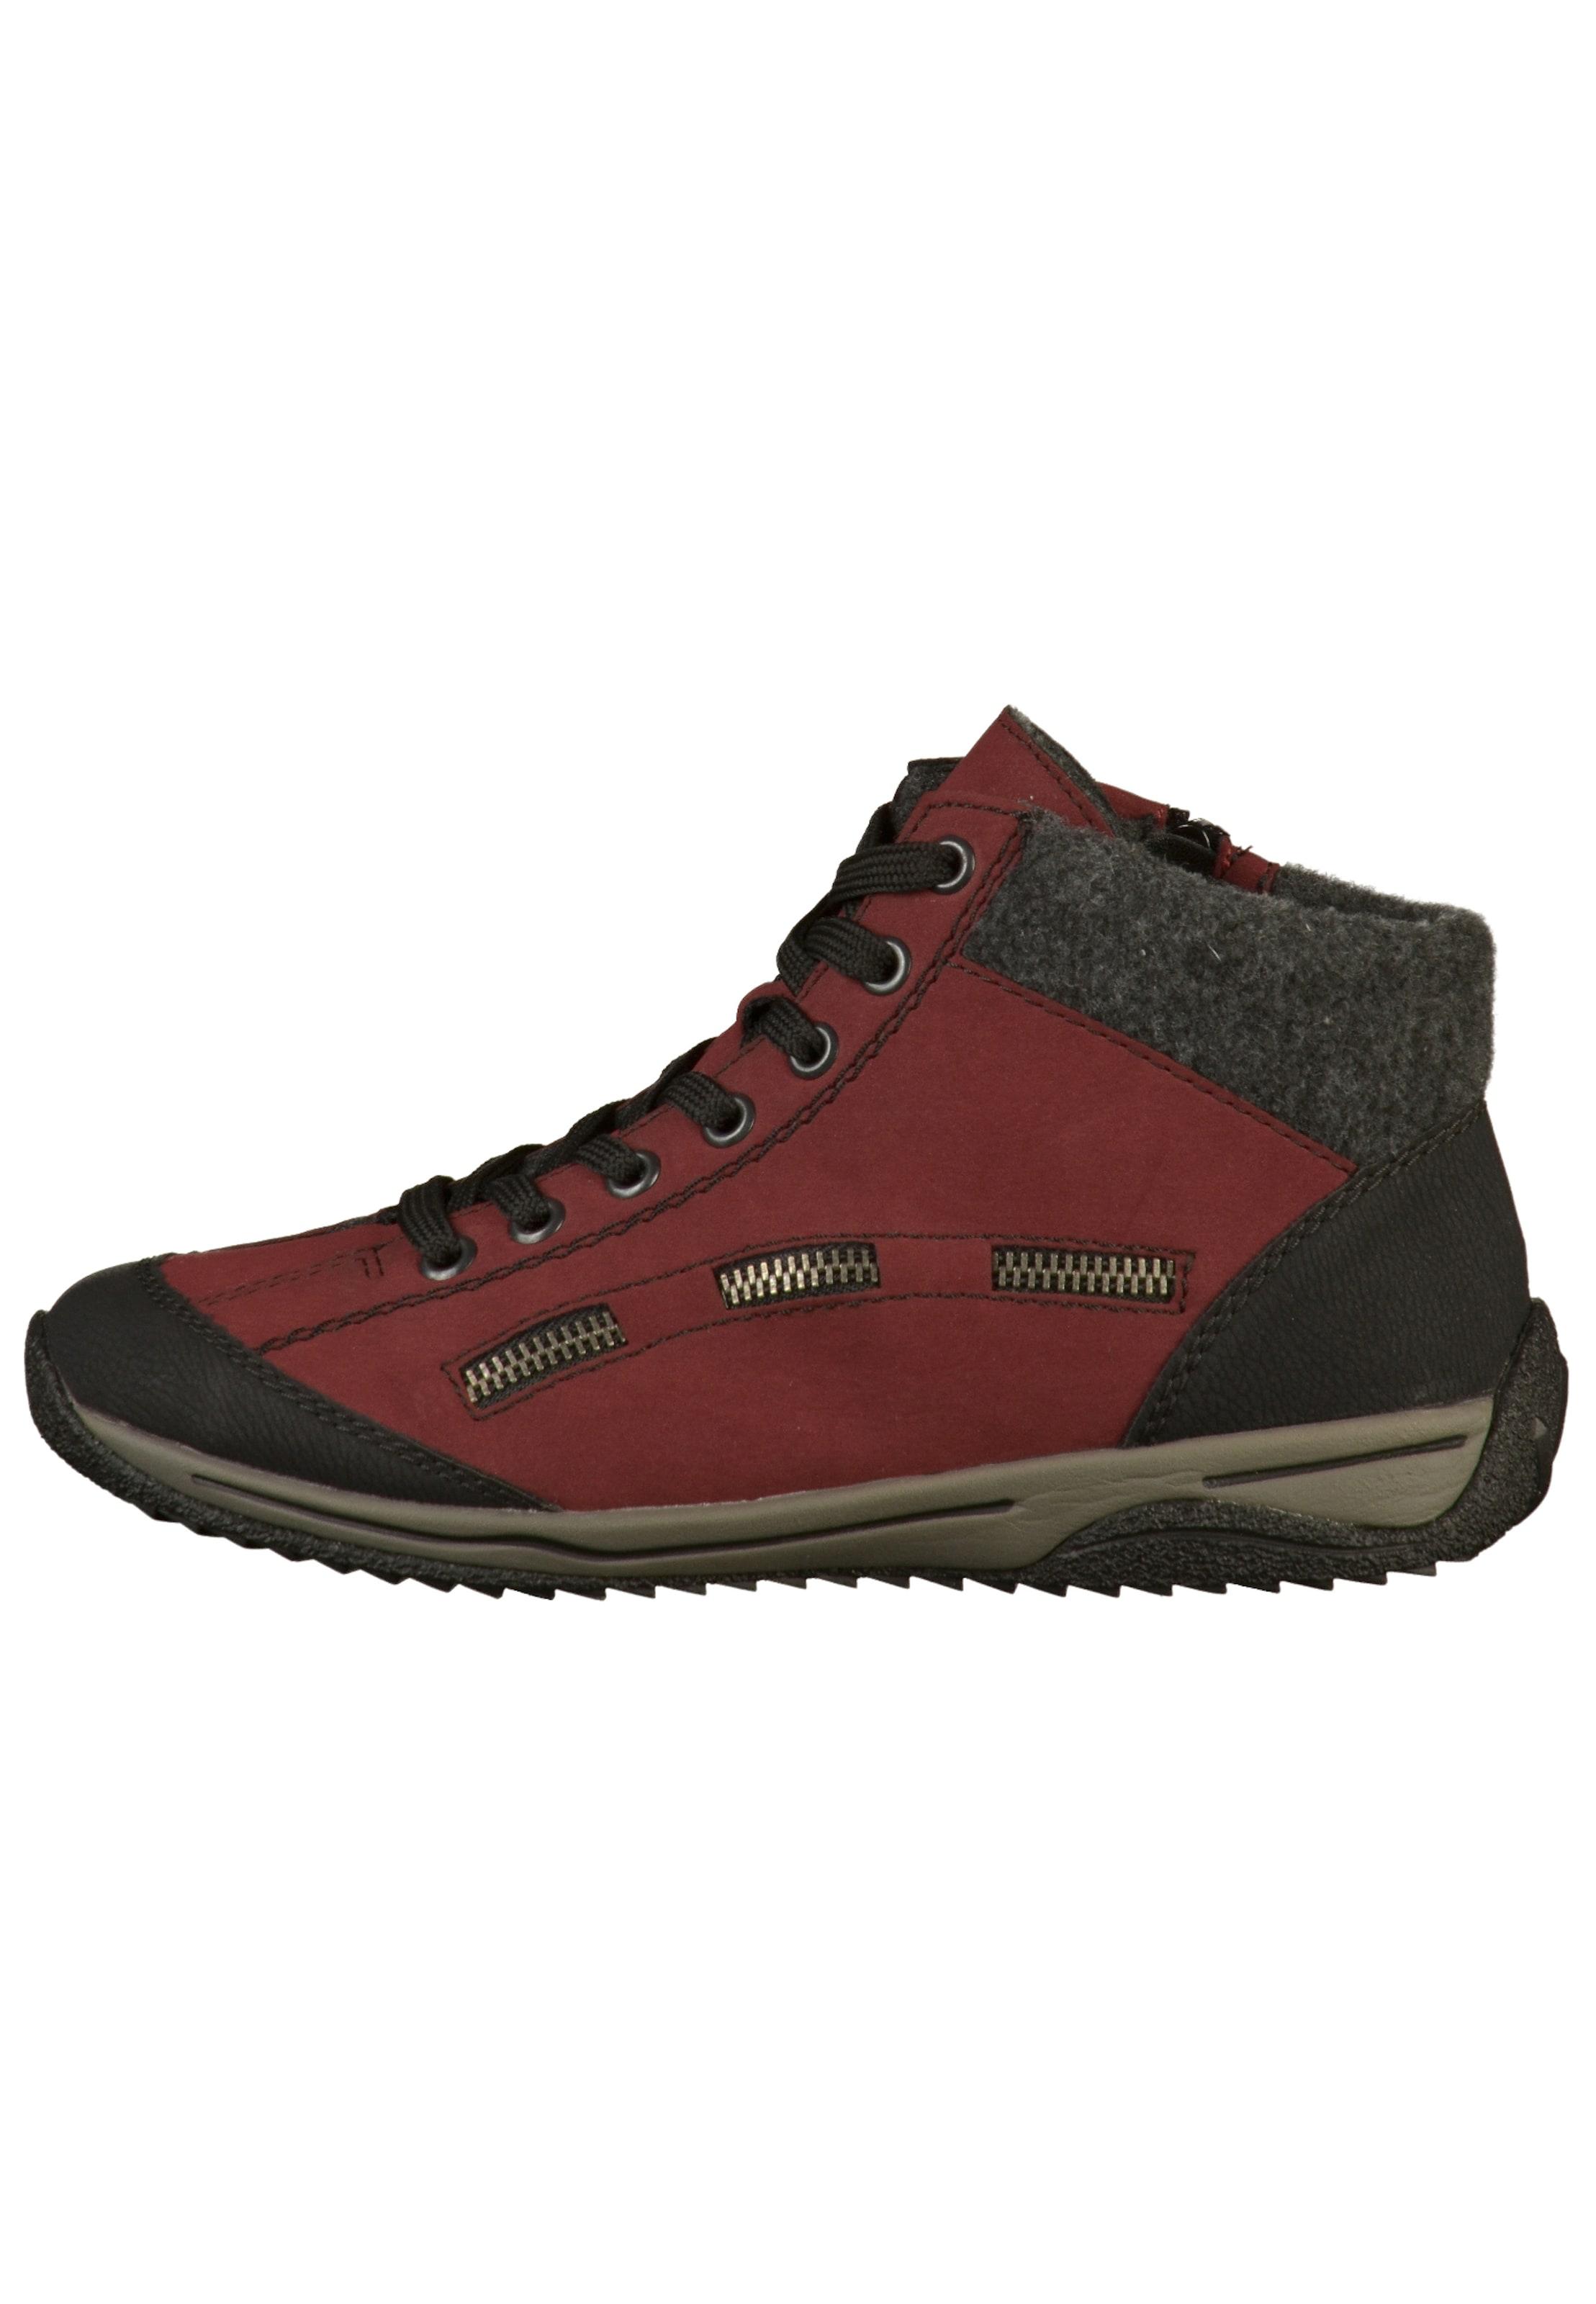 Sneaker In AnthrazitDunkelrot AnthrazitDunkelrot Rieker Rieker In Sneaker In AnthrazitDunkelrot Rieker Sneaker tsrdhQCx